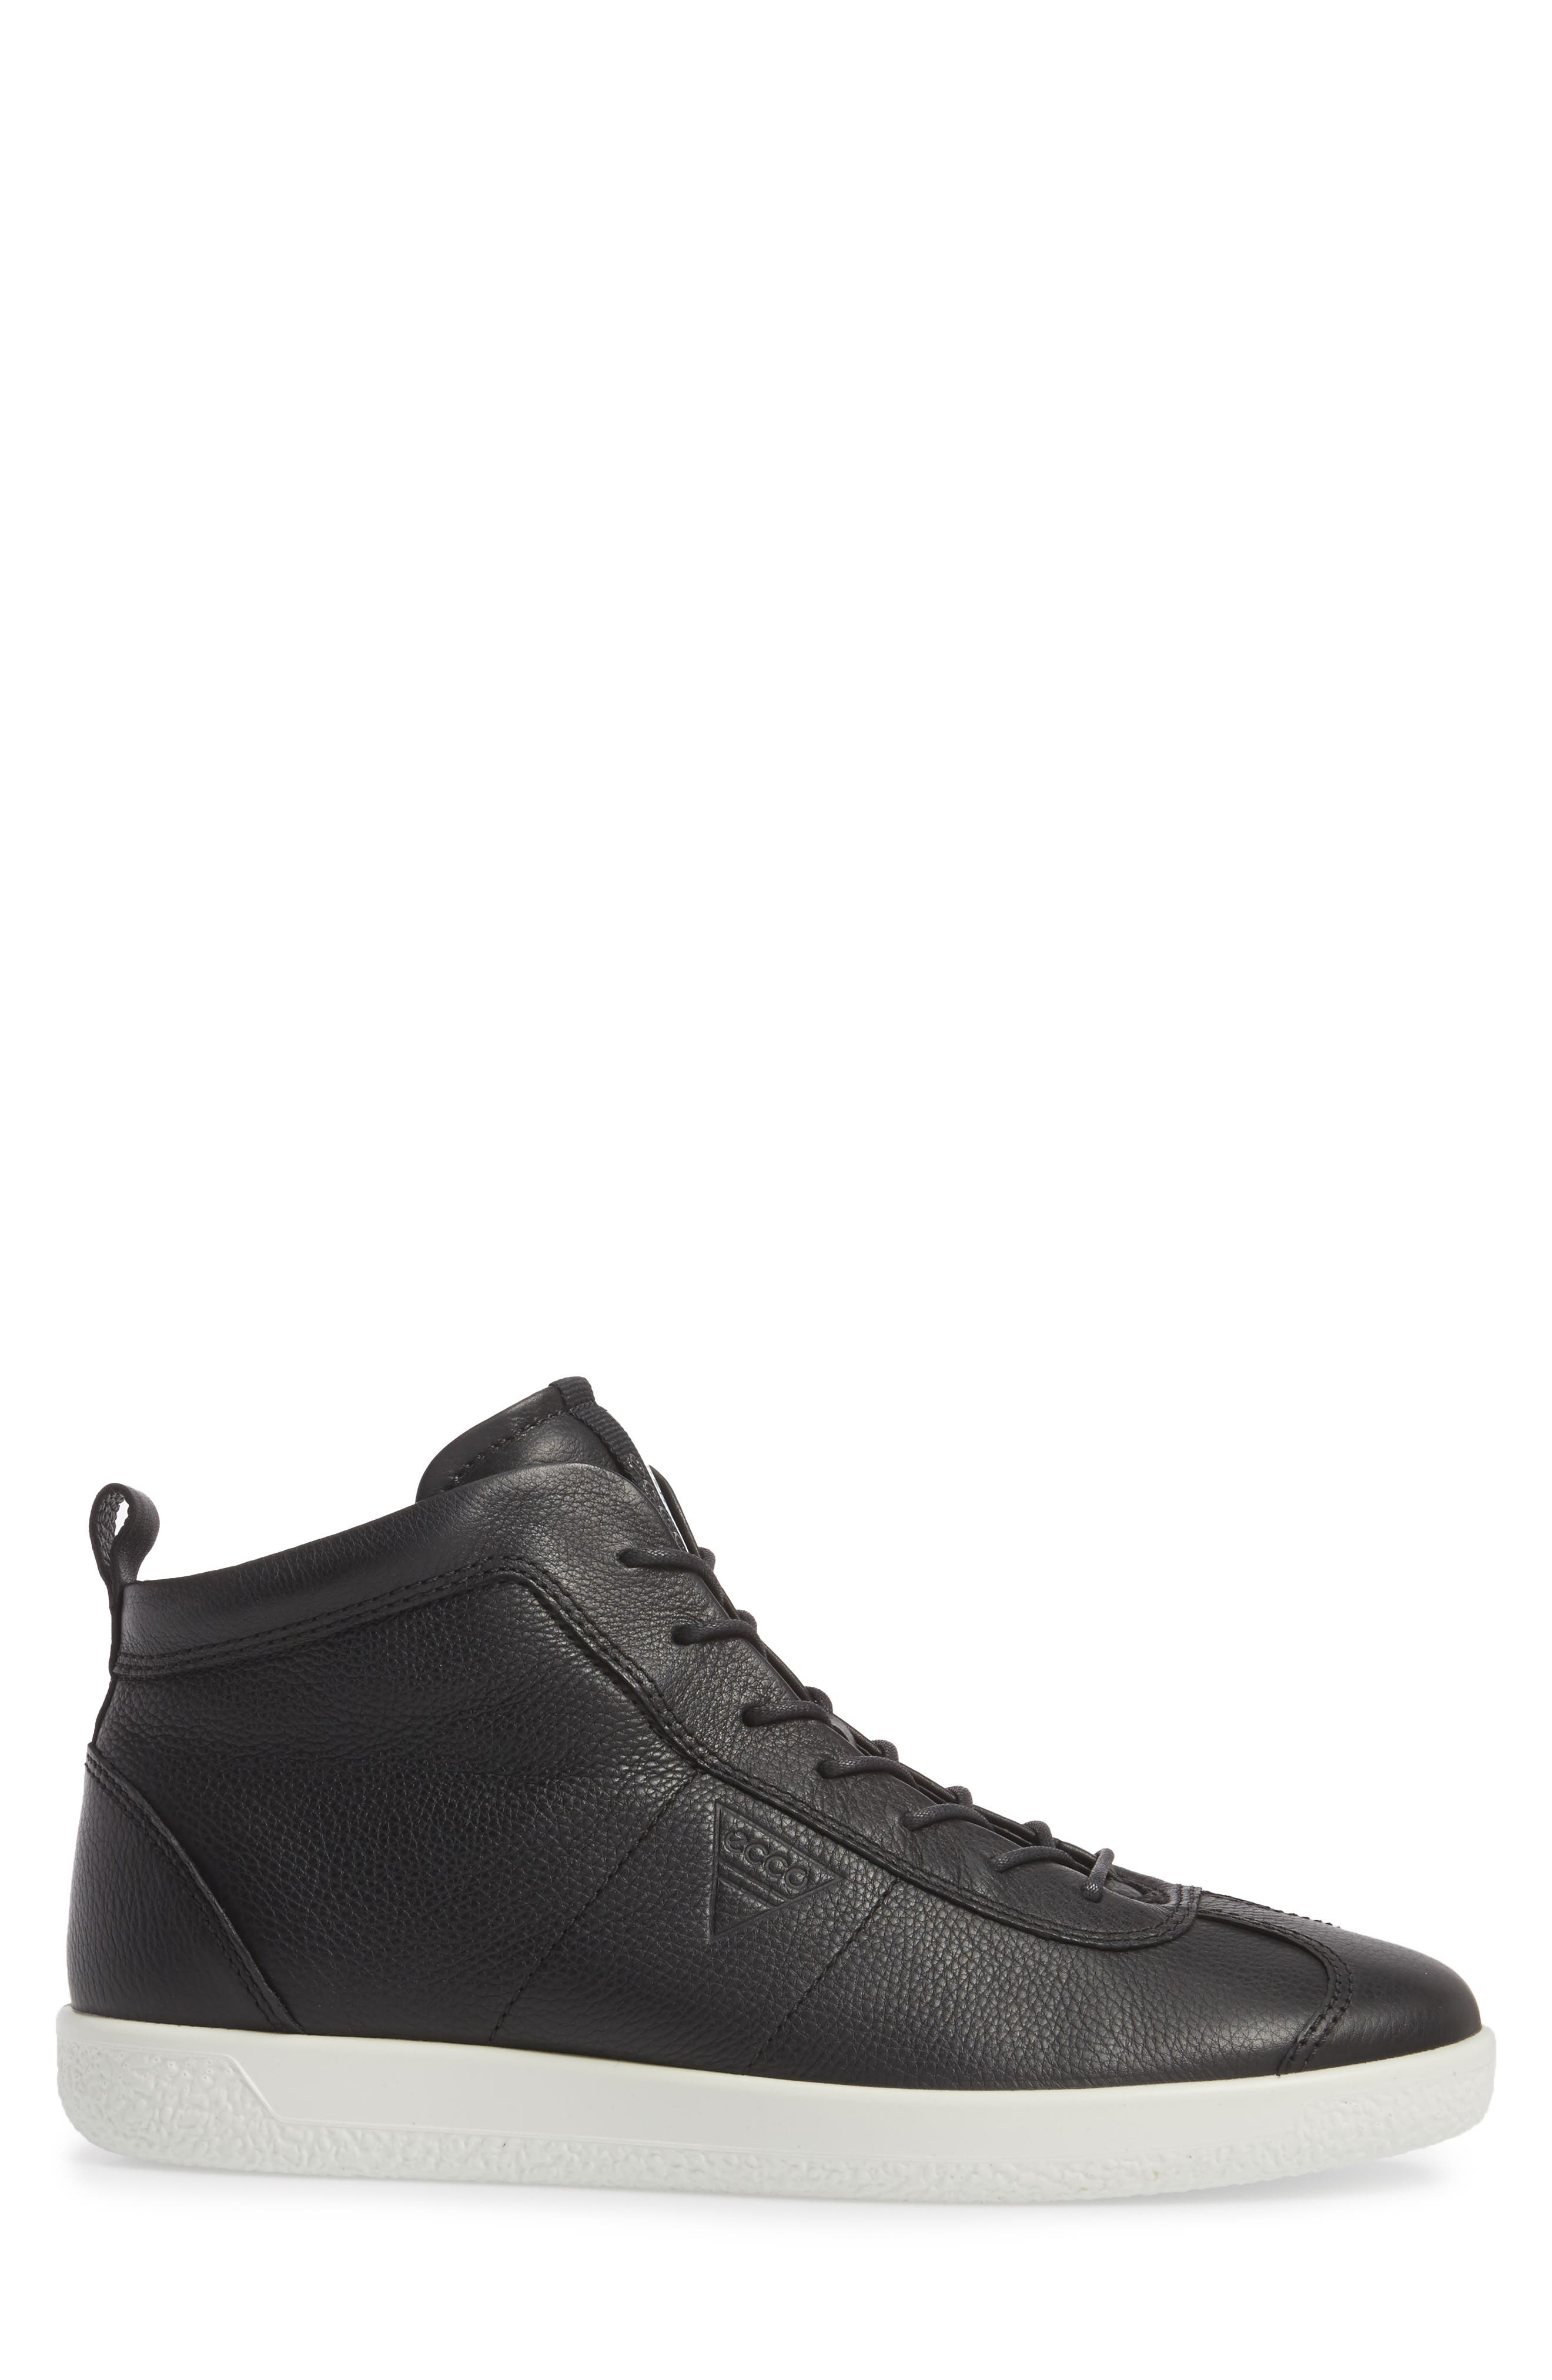 Alternate Image 3  - ECCO Soft 1 High Top Sneaker (Men)